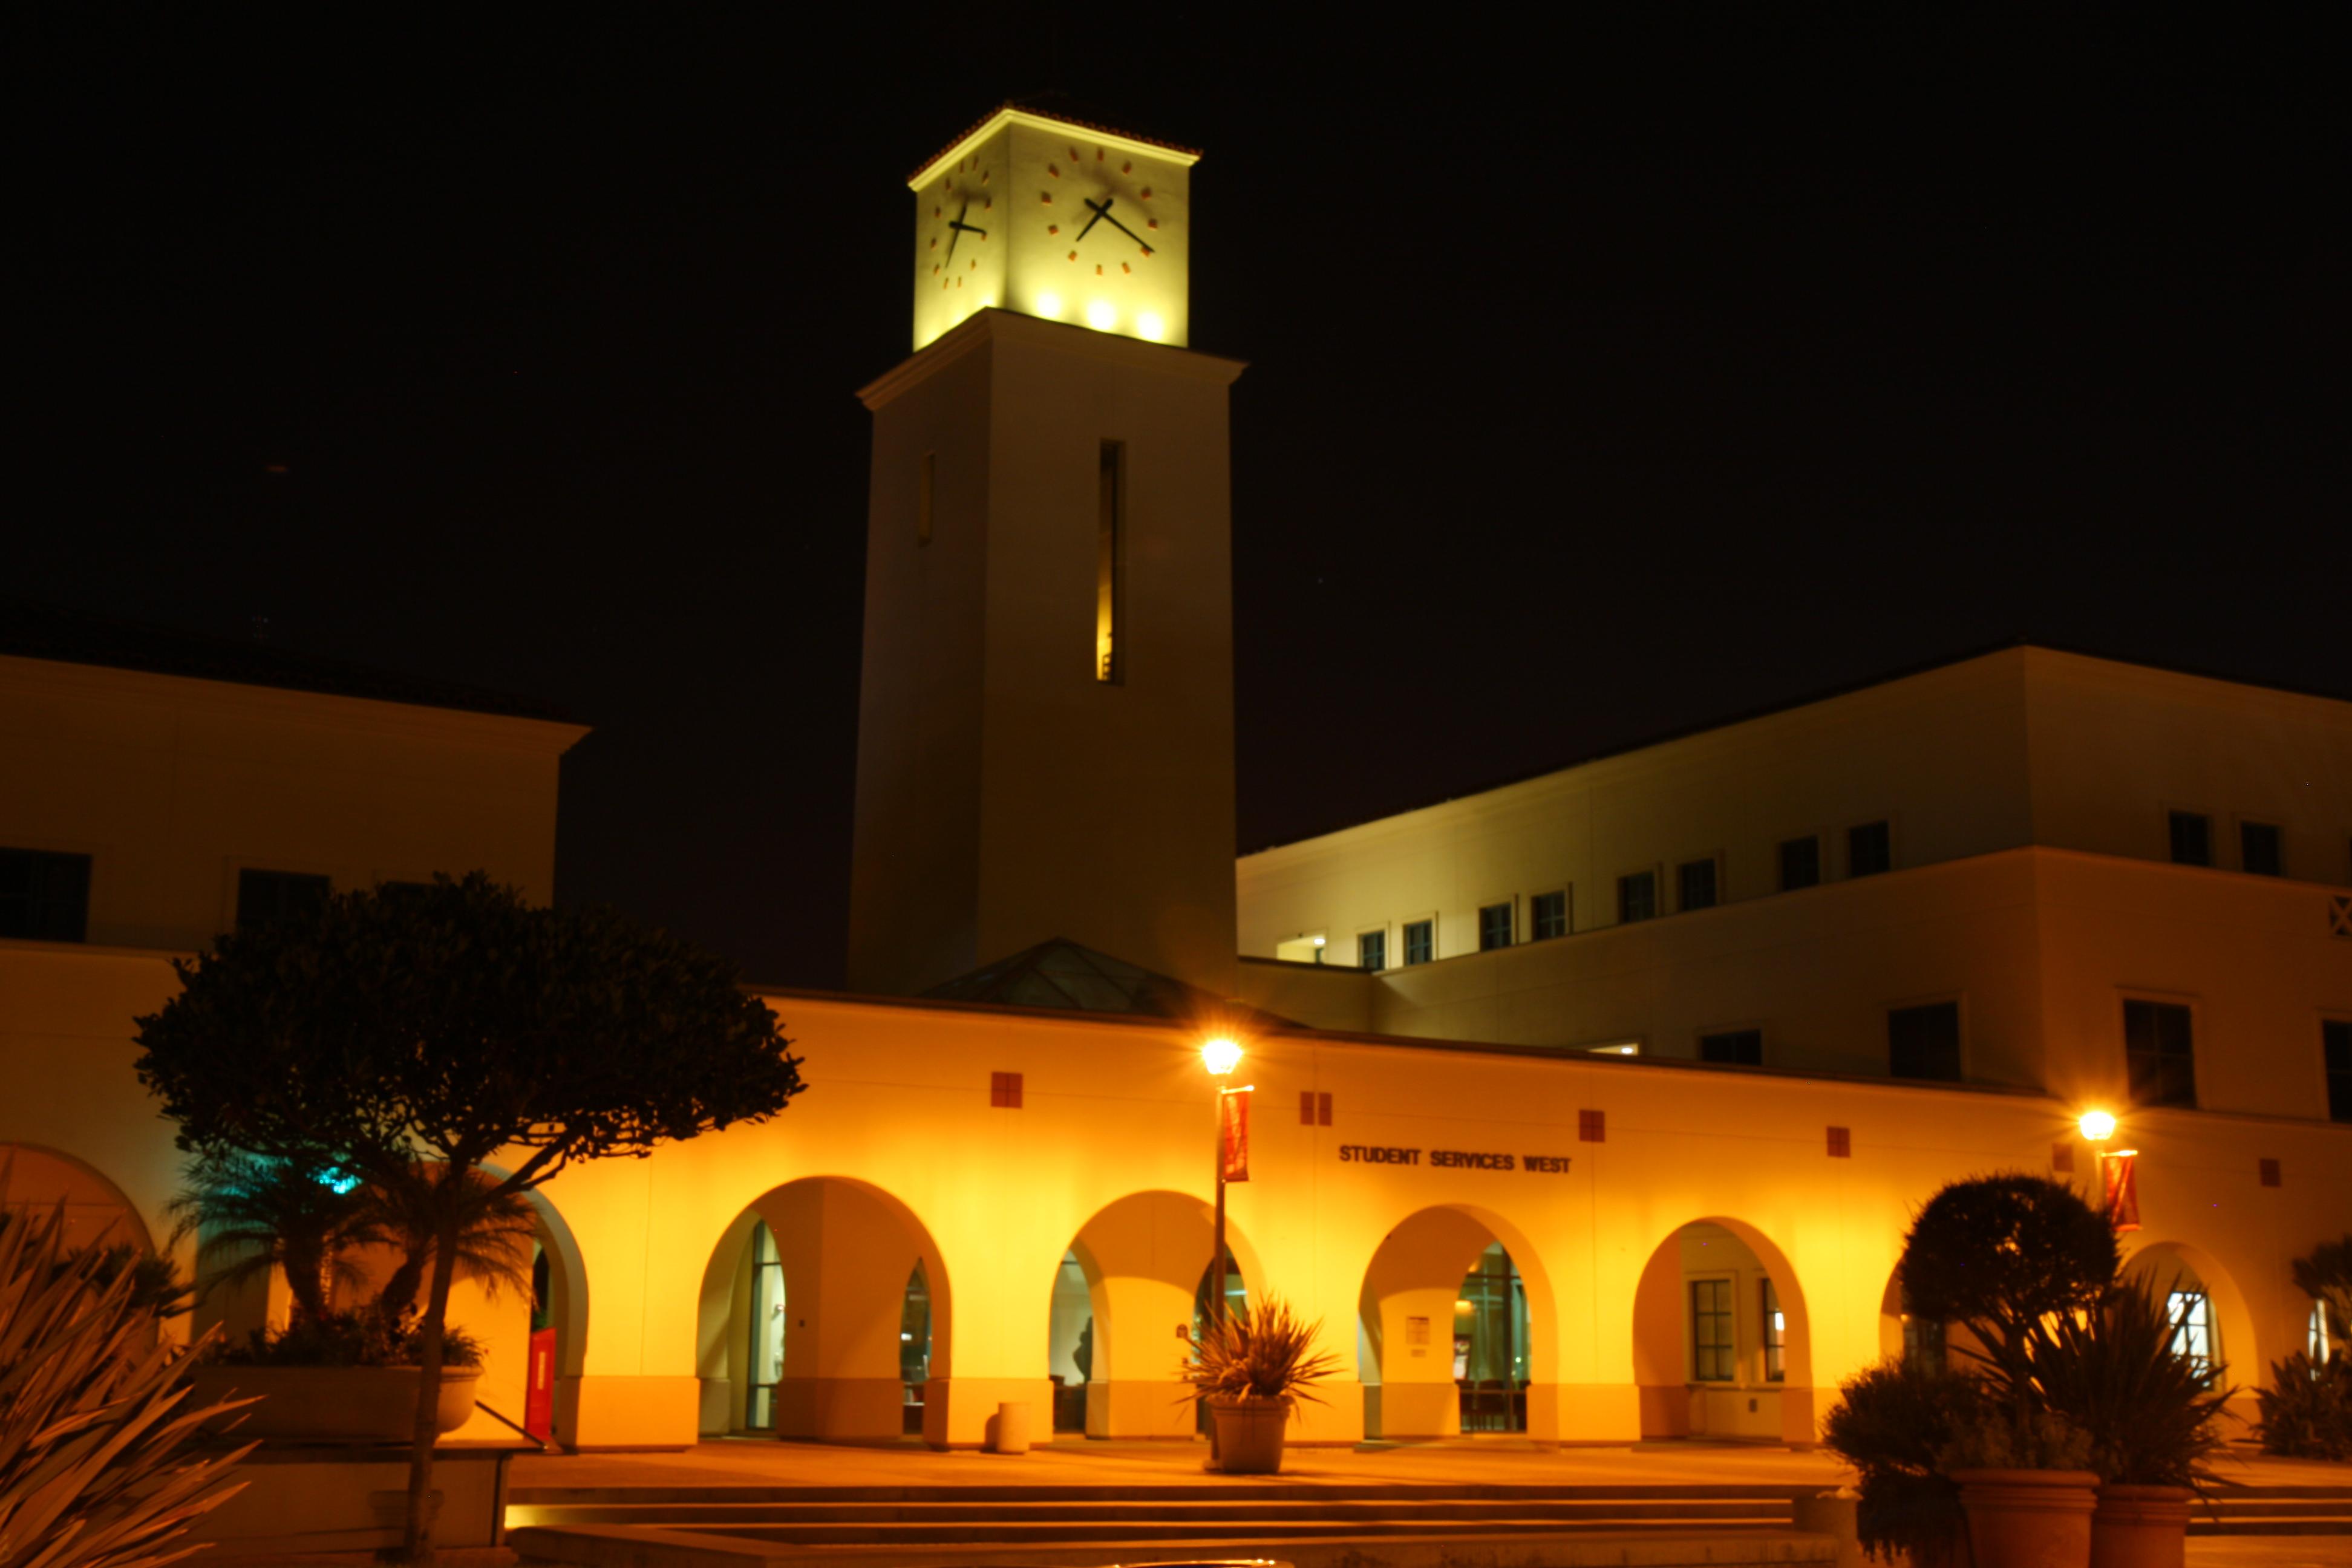 san_diego_university_library_124.jpg